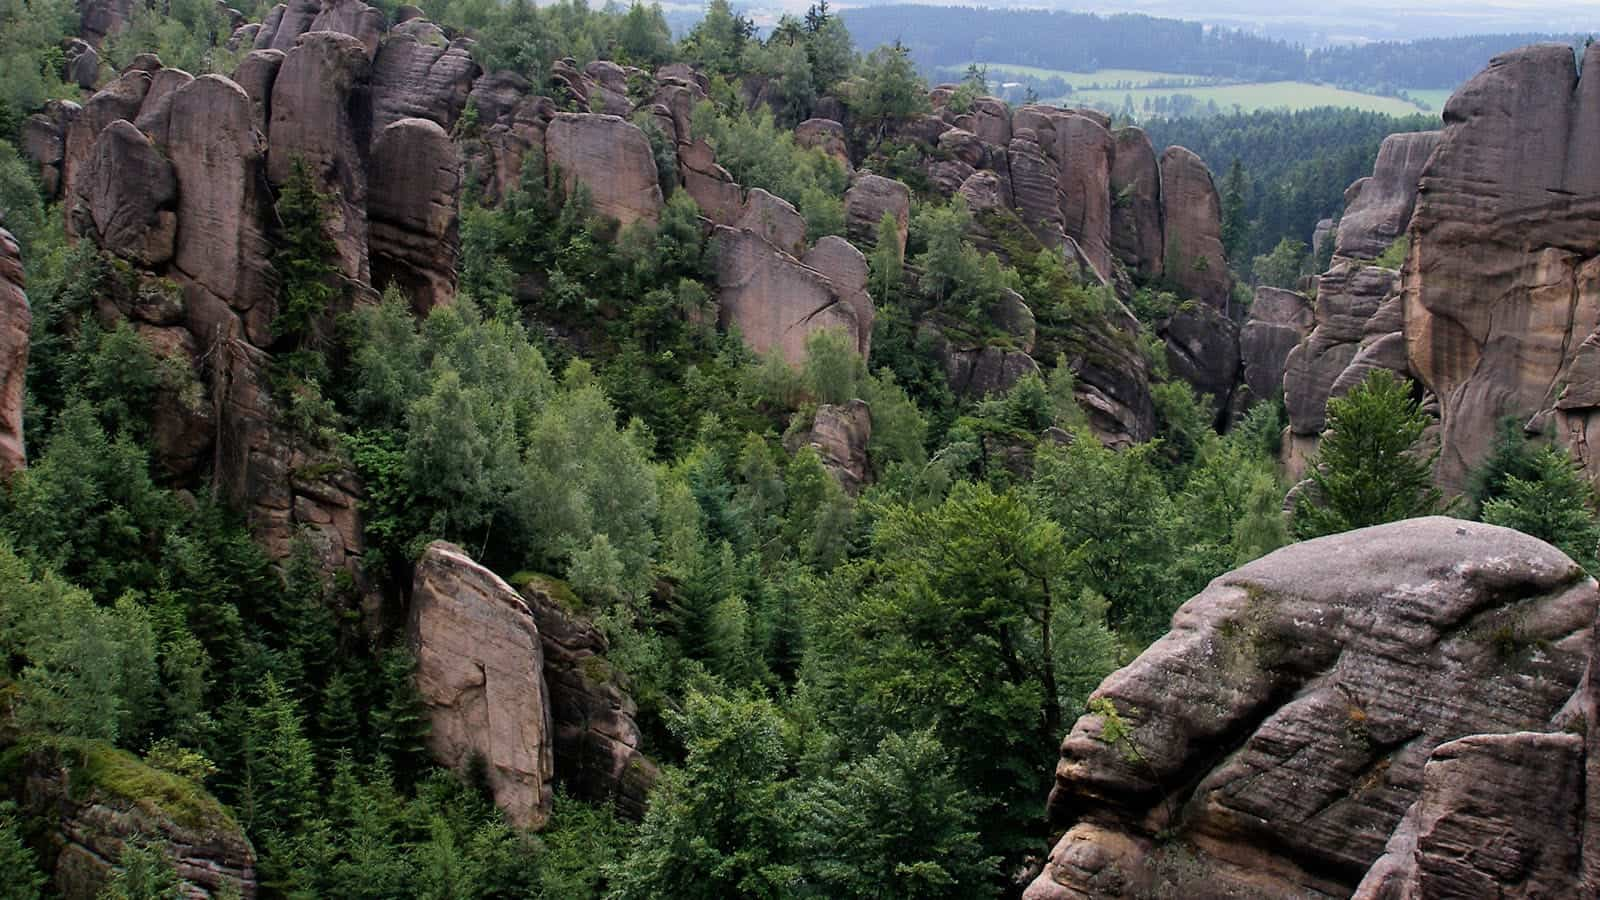 Kamenné divadlo v Broumovských stěnách